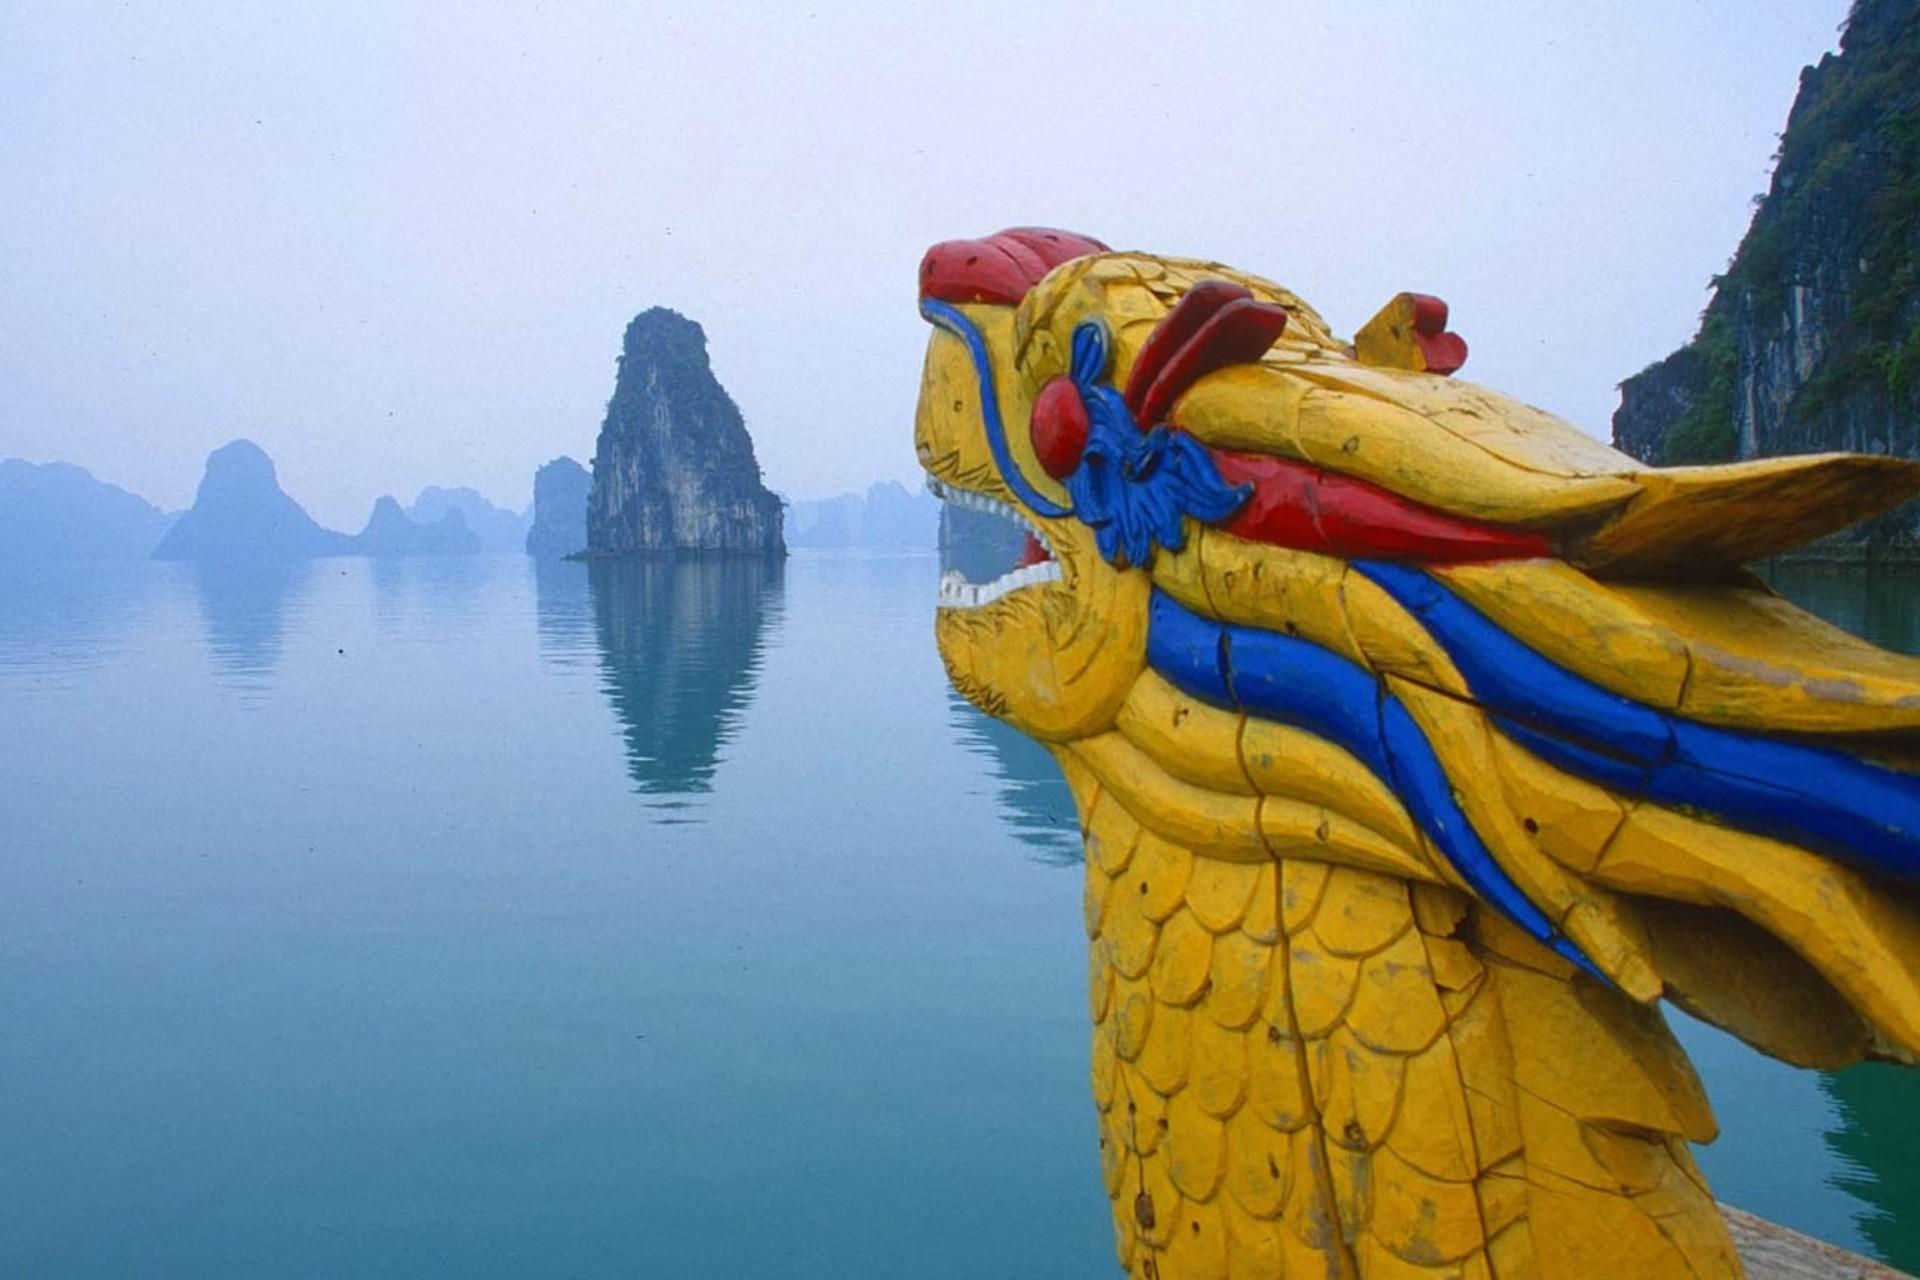 166-1668866_halong-bay-vietnam-vietnam-famous-tourist-spots.jpg